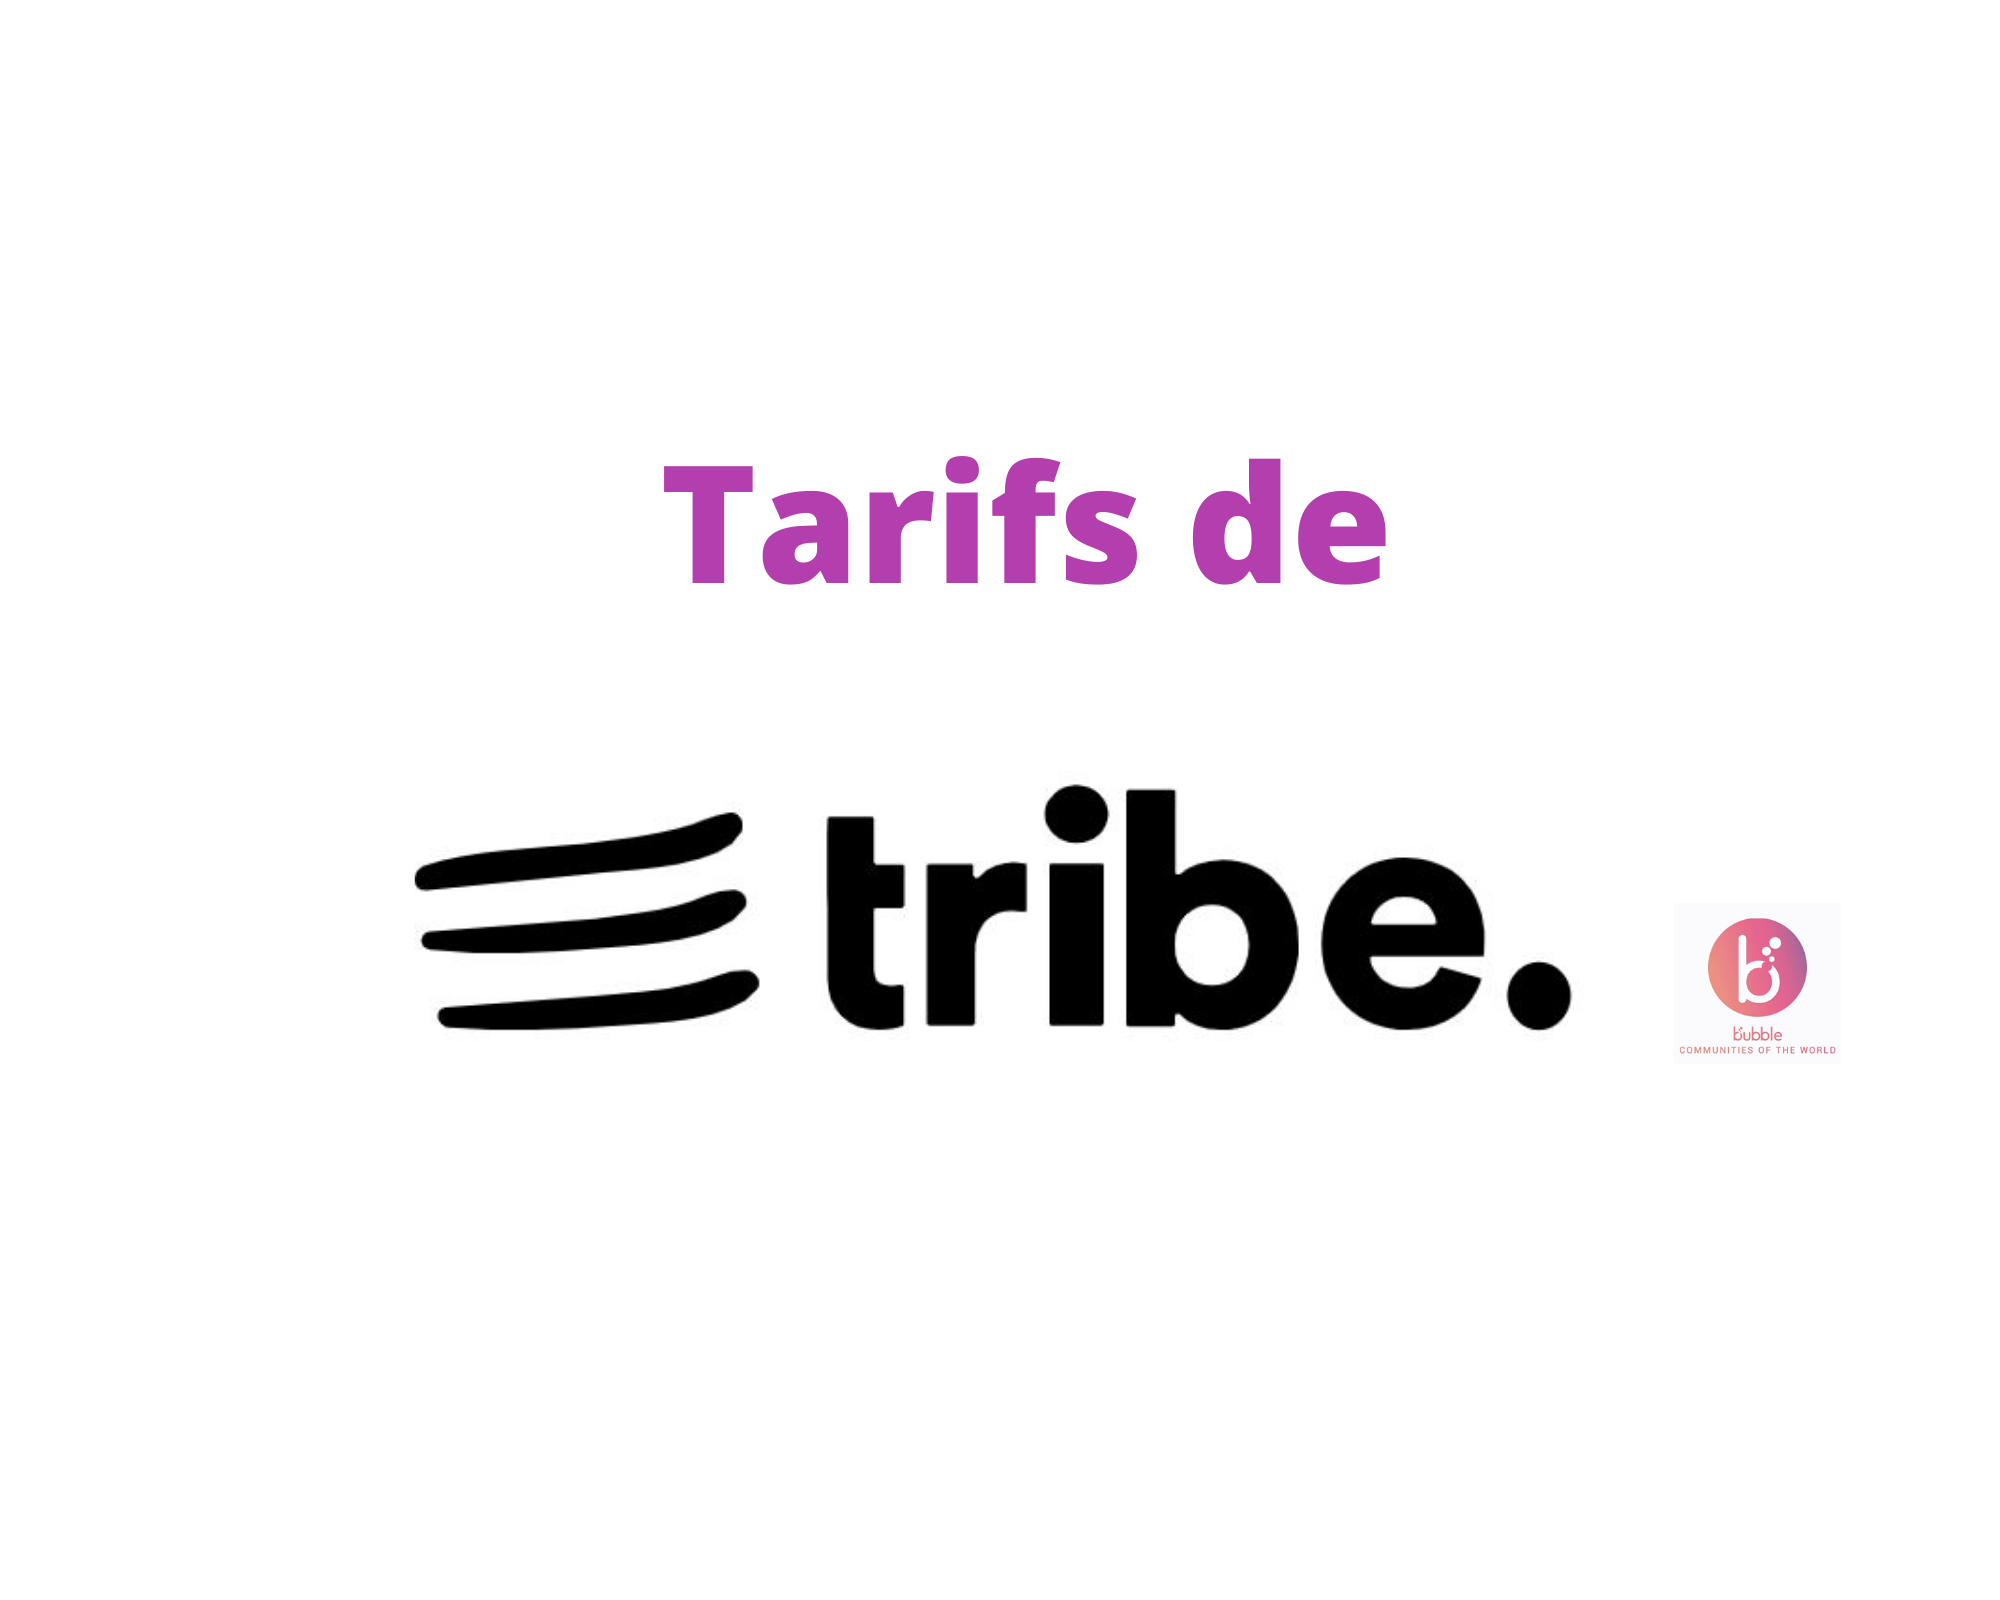 Les tarifs de Tribe